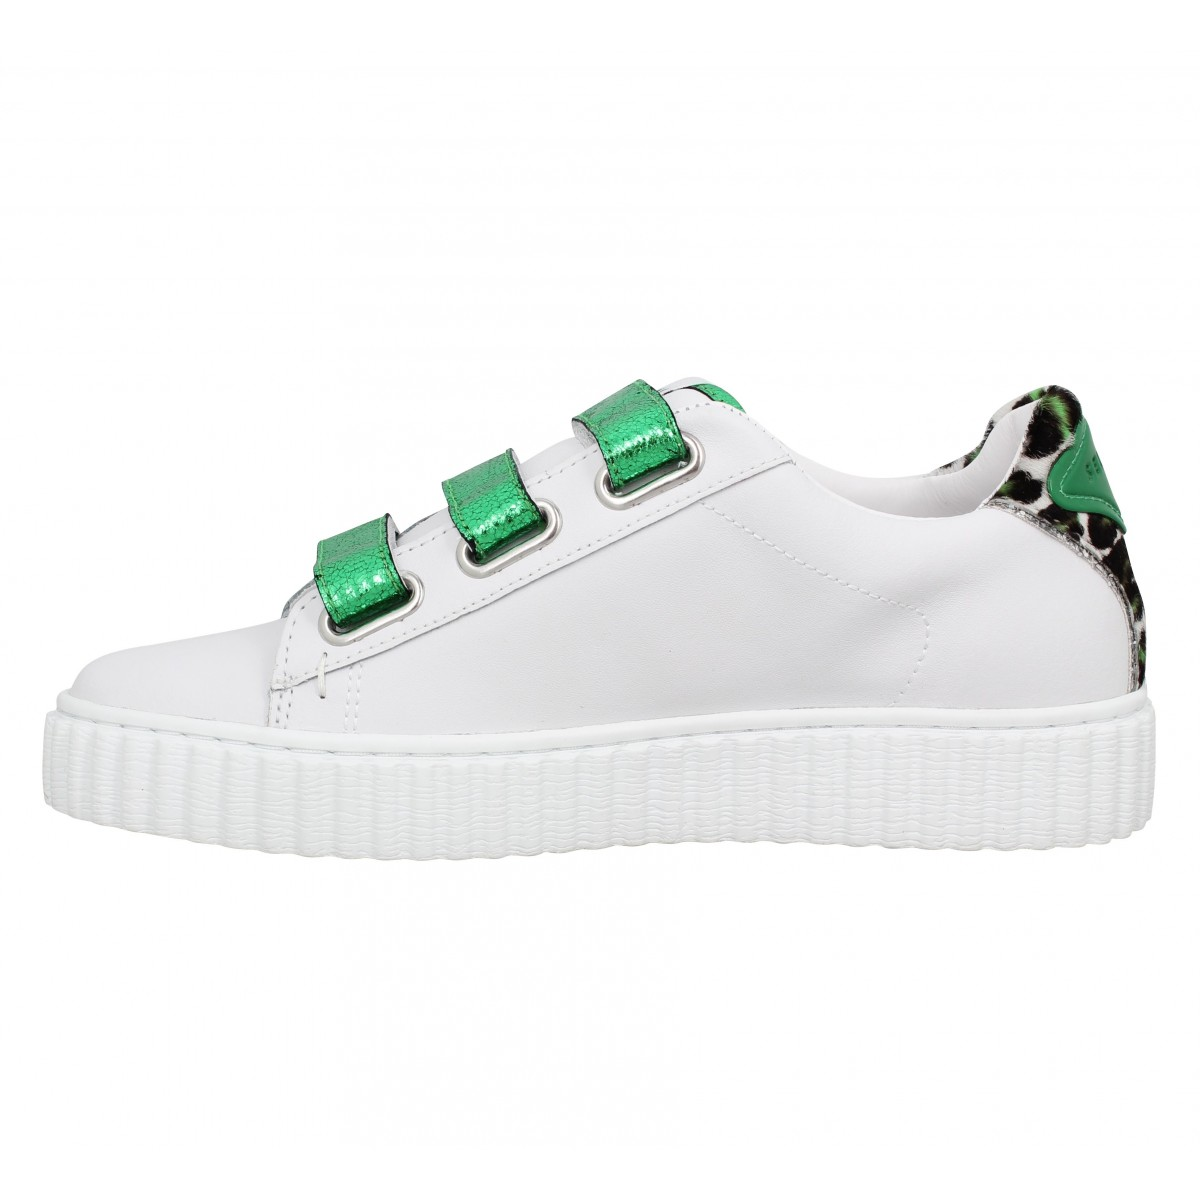 Chaussures Serafini madison cuir femme blanc vert femme